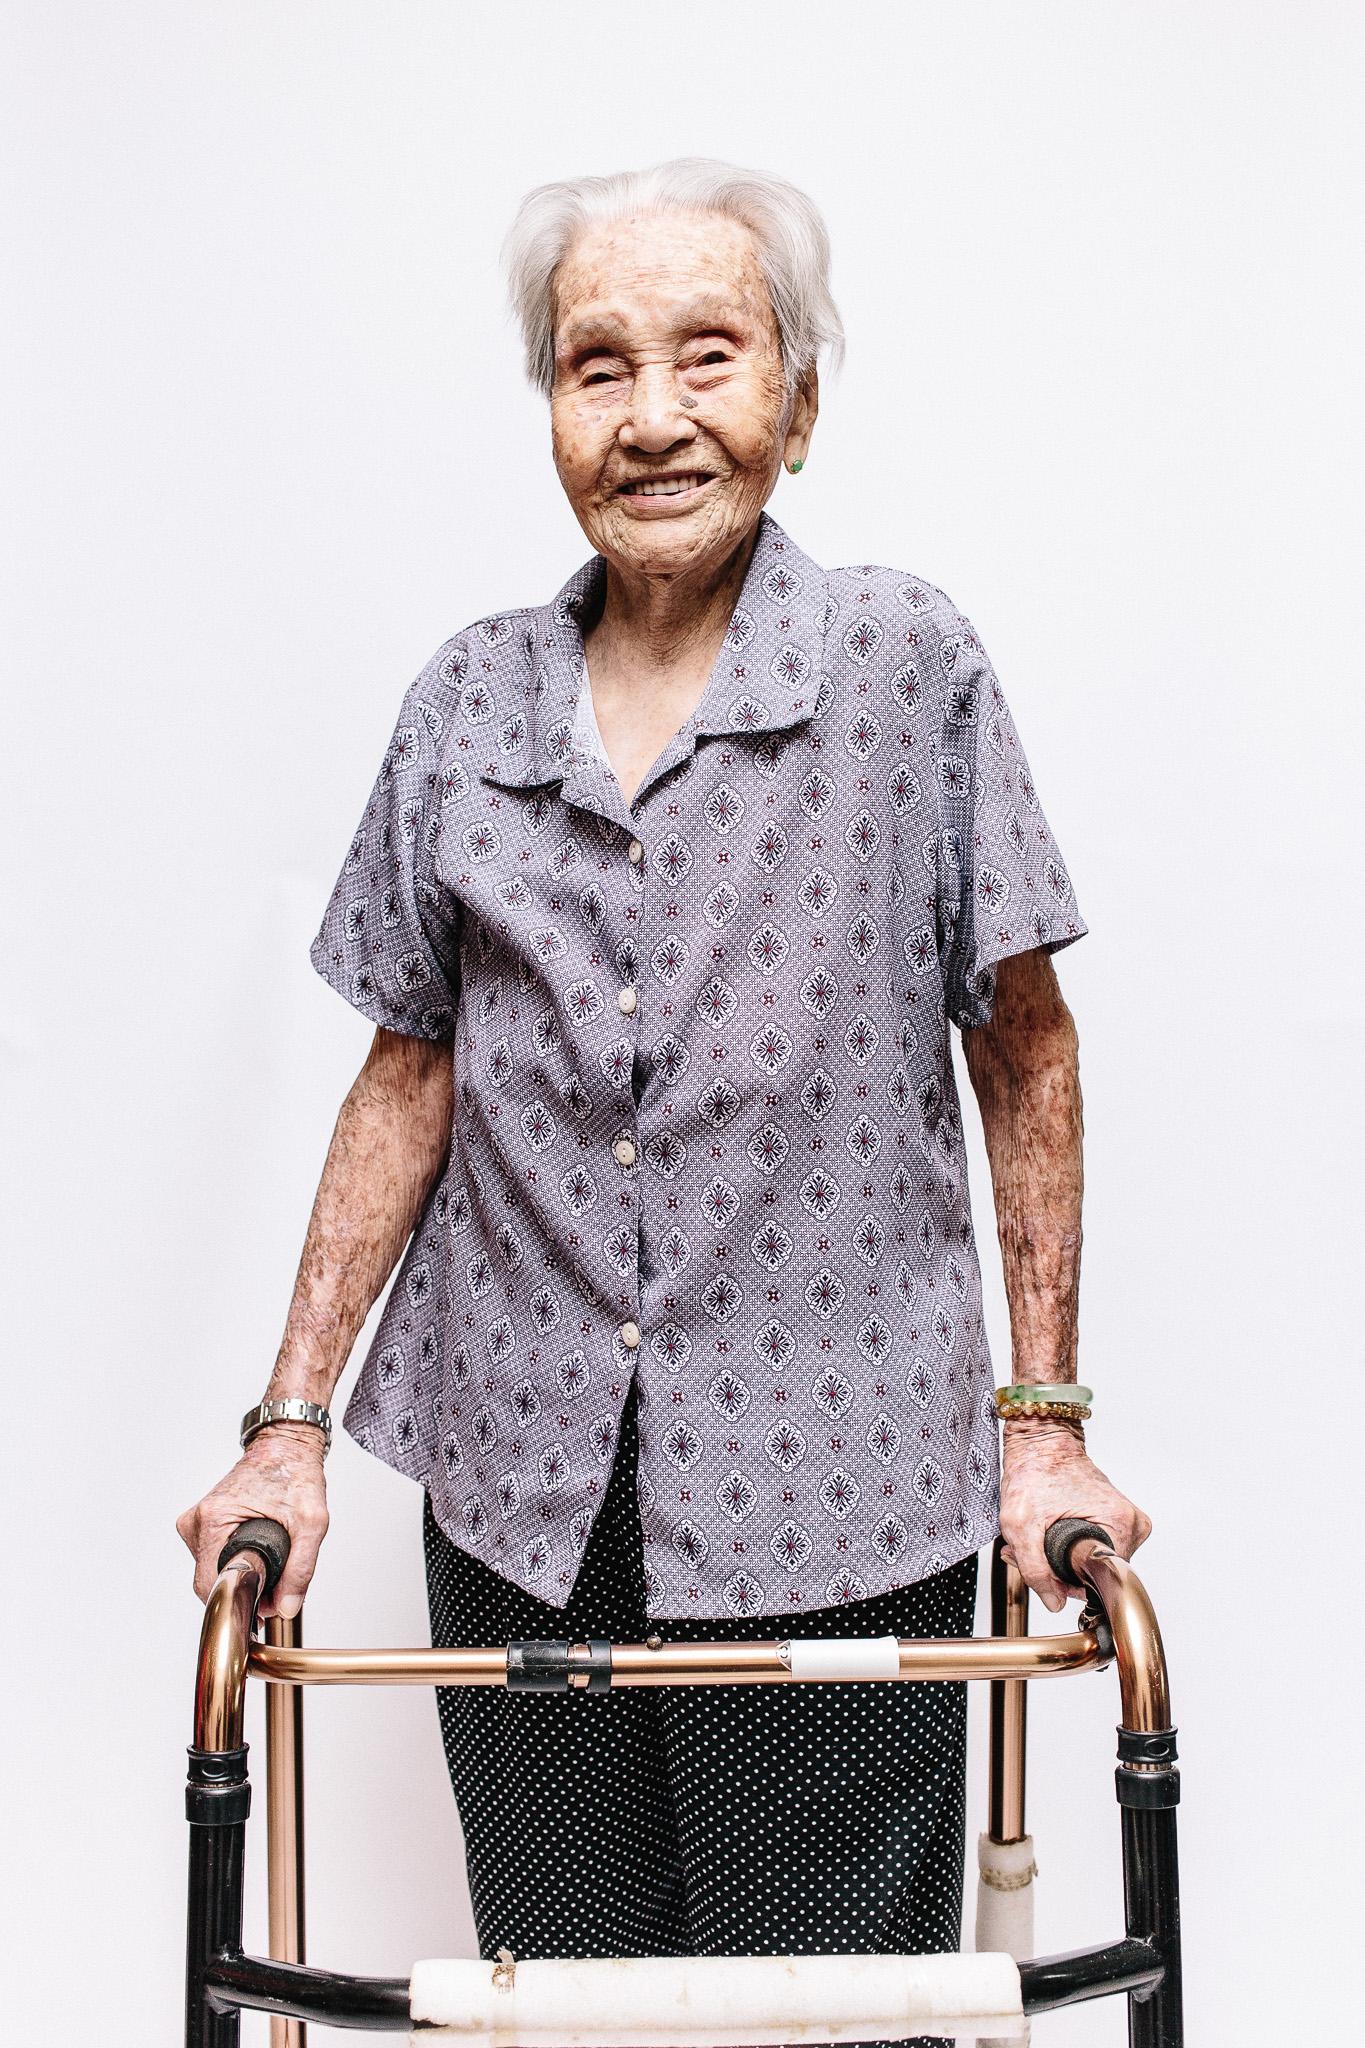 zainal-zainal-studio-centenarians-care-duke-nus-singapore-photographer-20.jpg